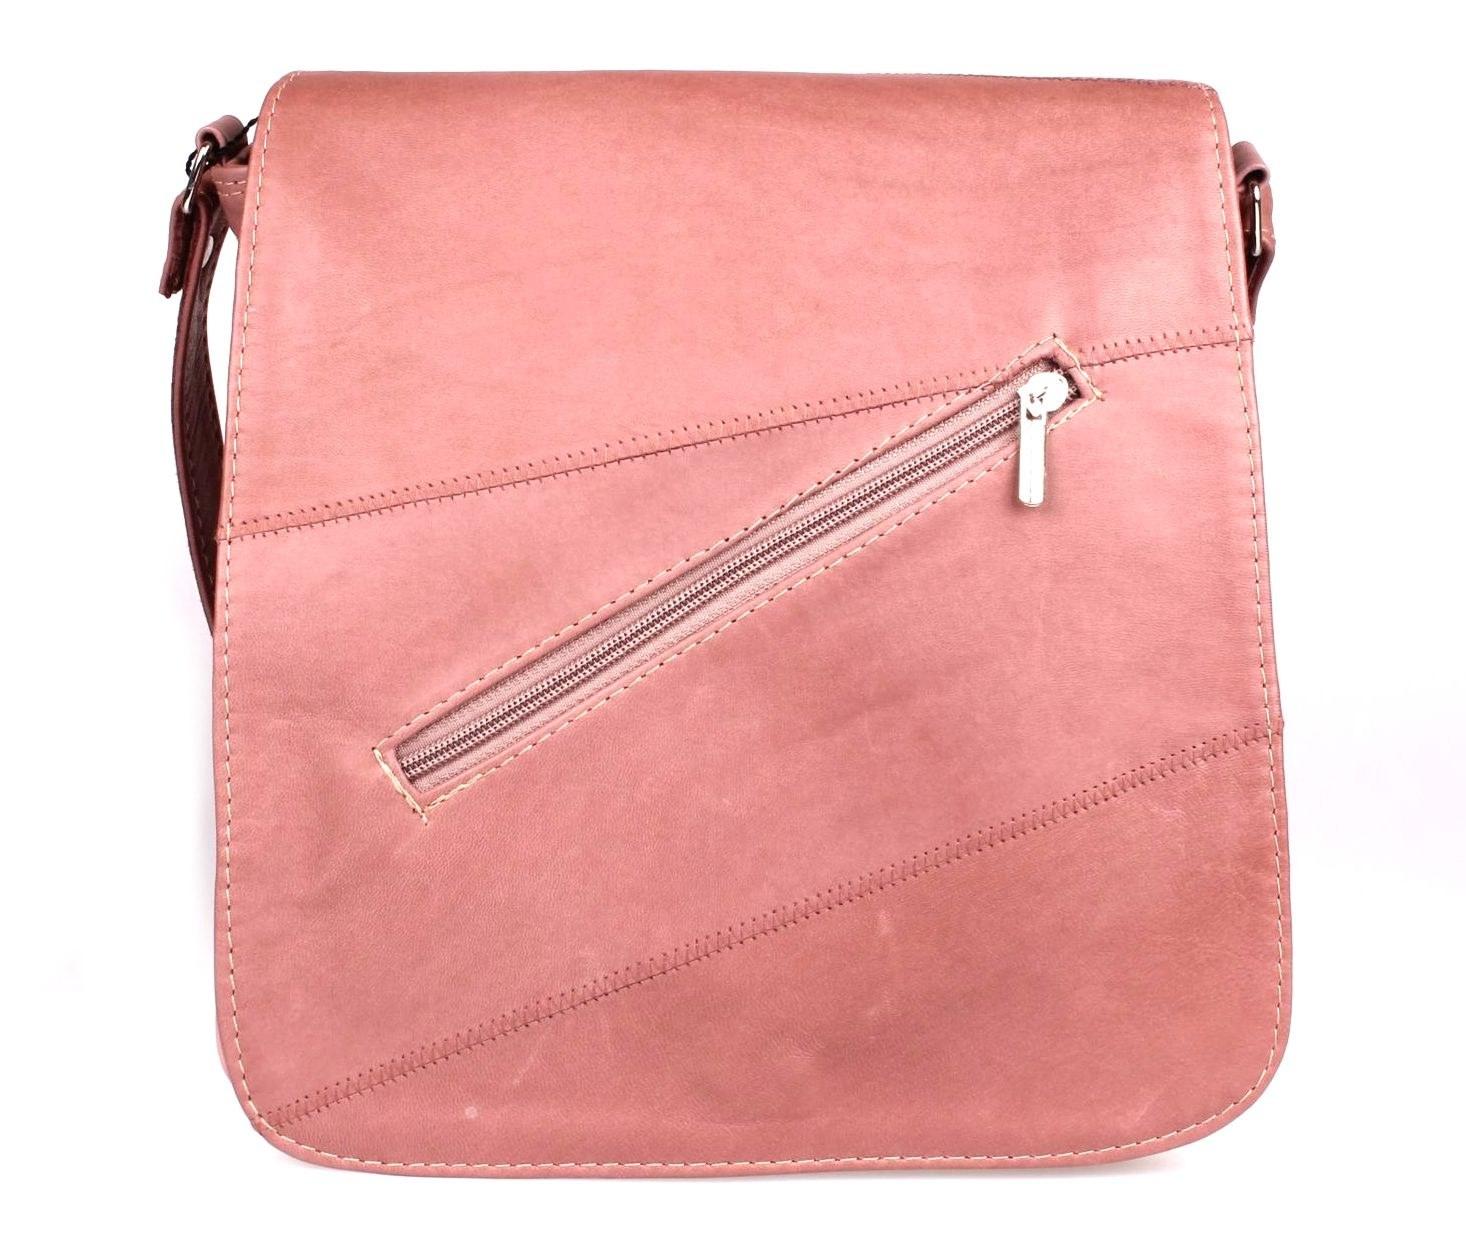 91f8a009d0447 MIL RAP torebka damska skórzana różowa